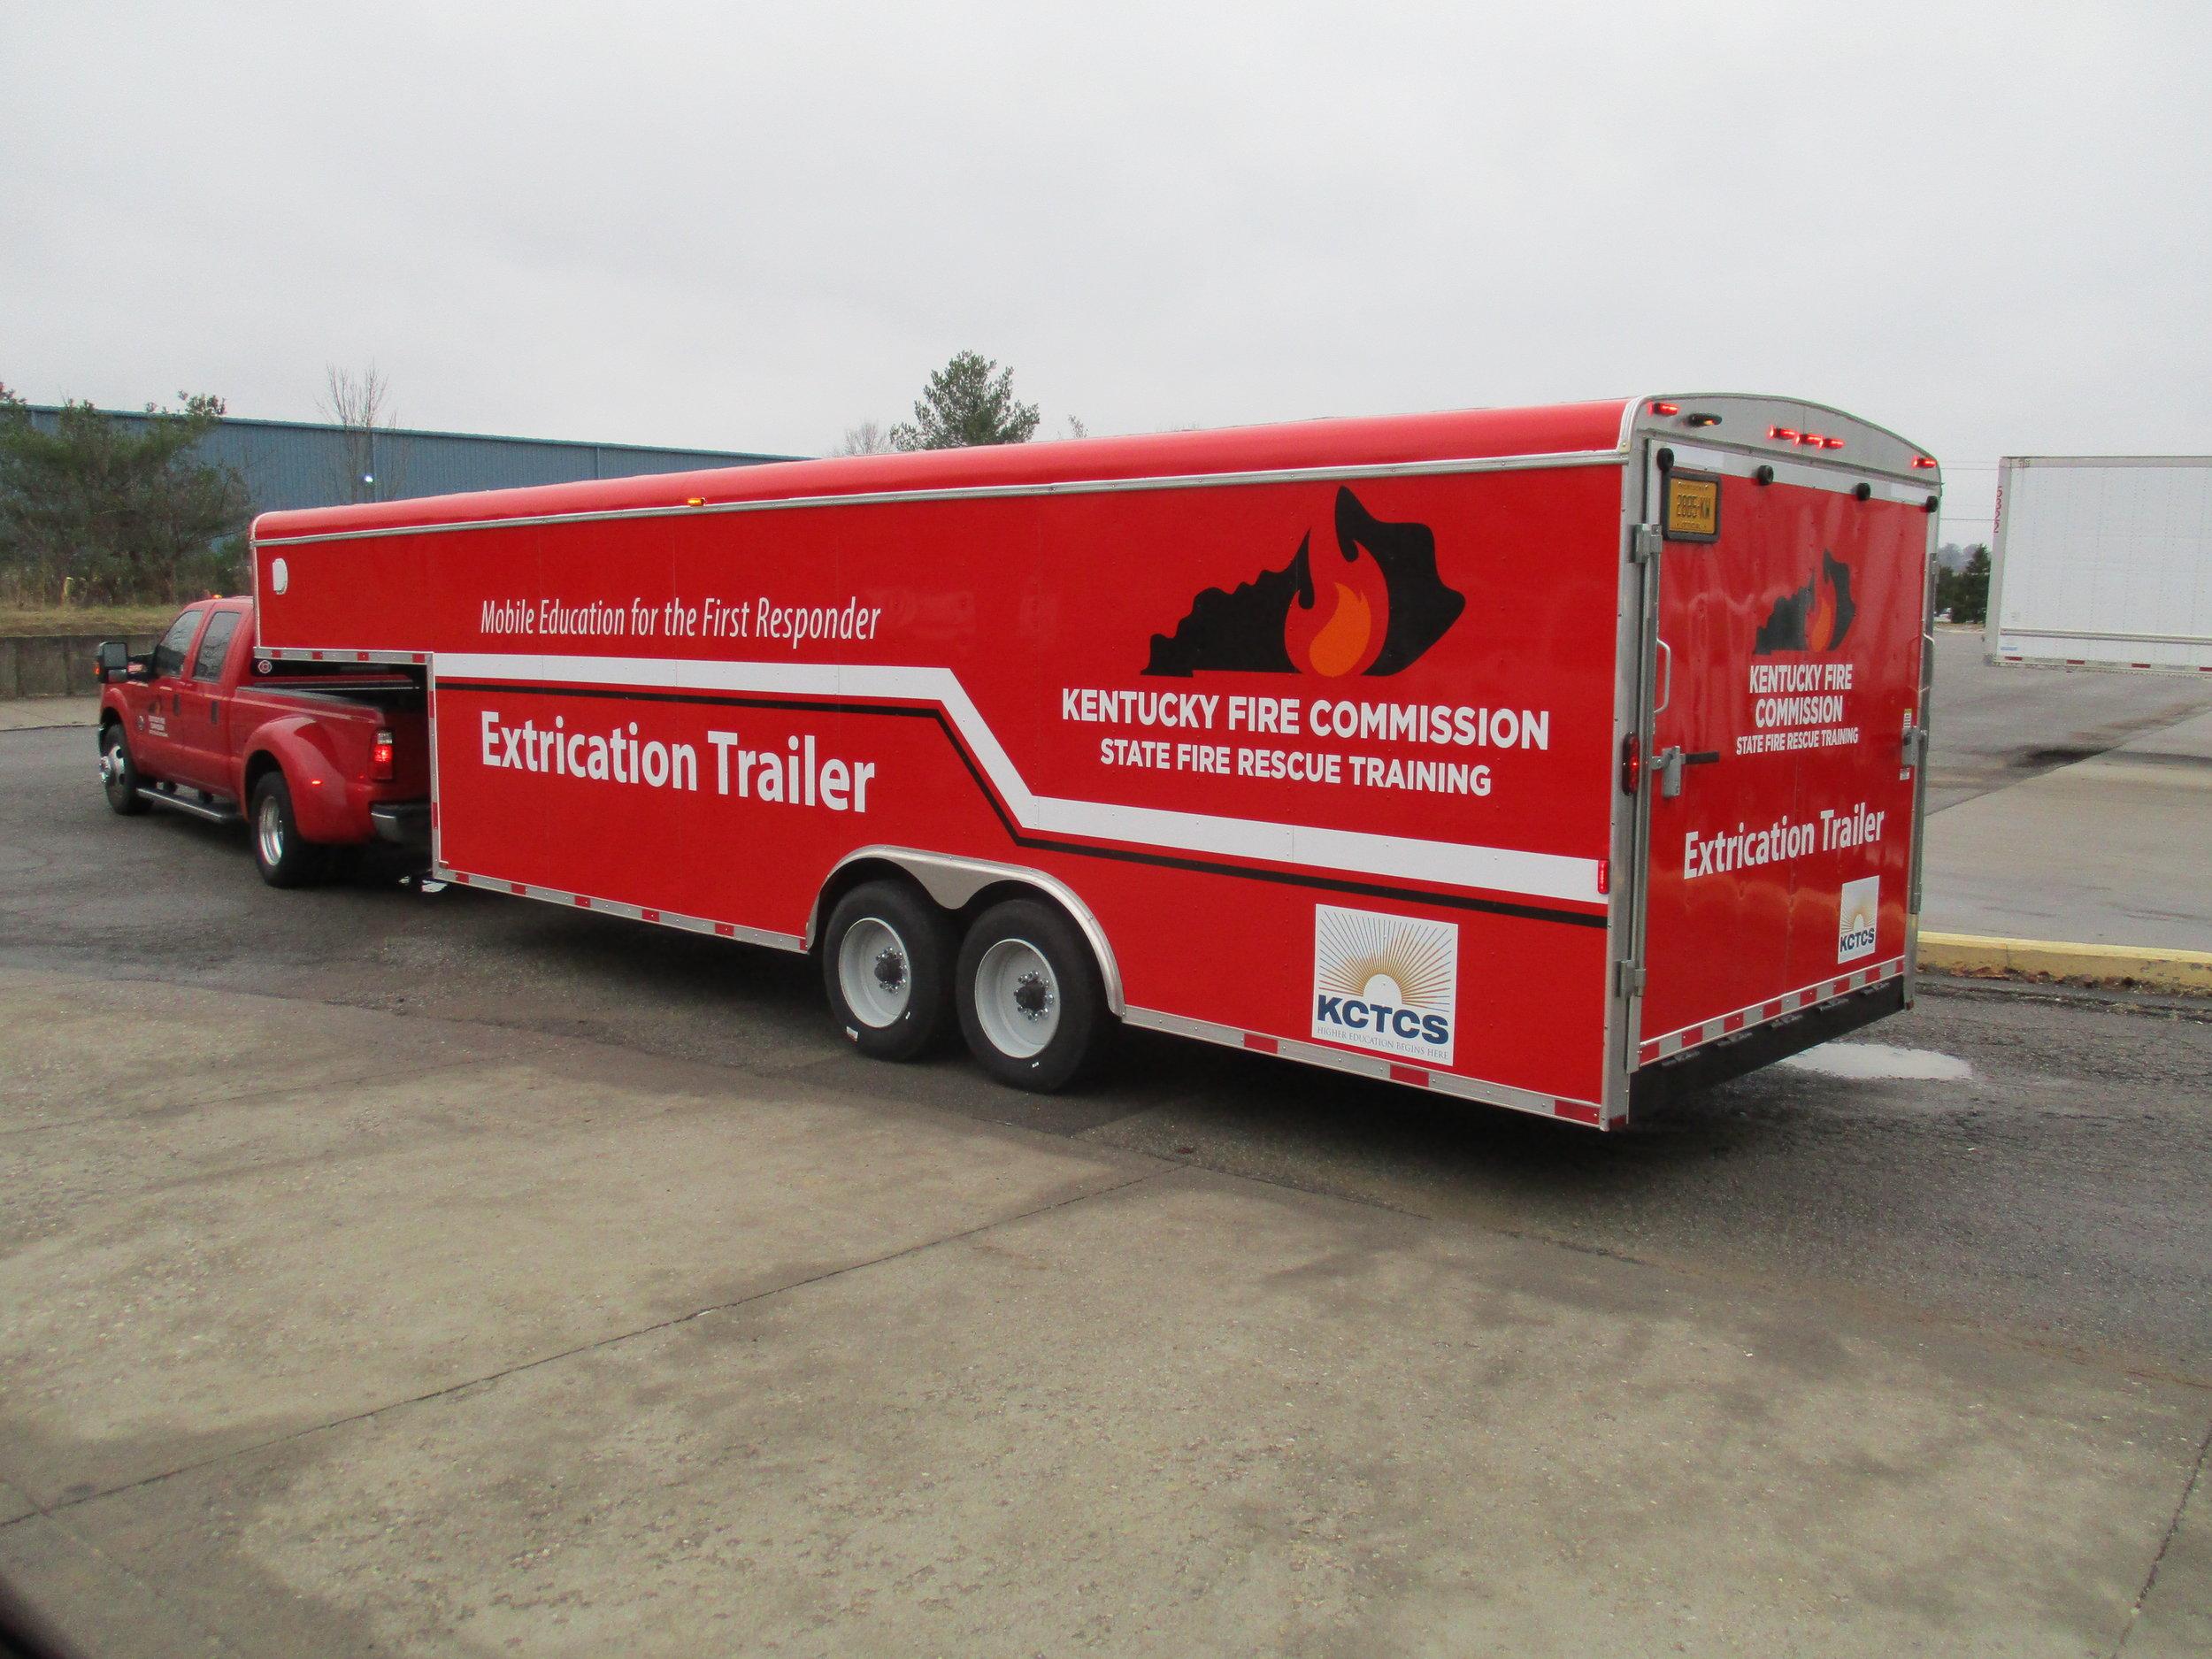 1702622 Kentucky Fire Commission (2).JPG